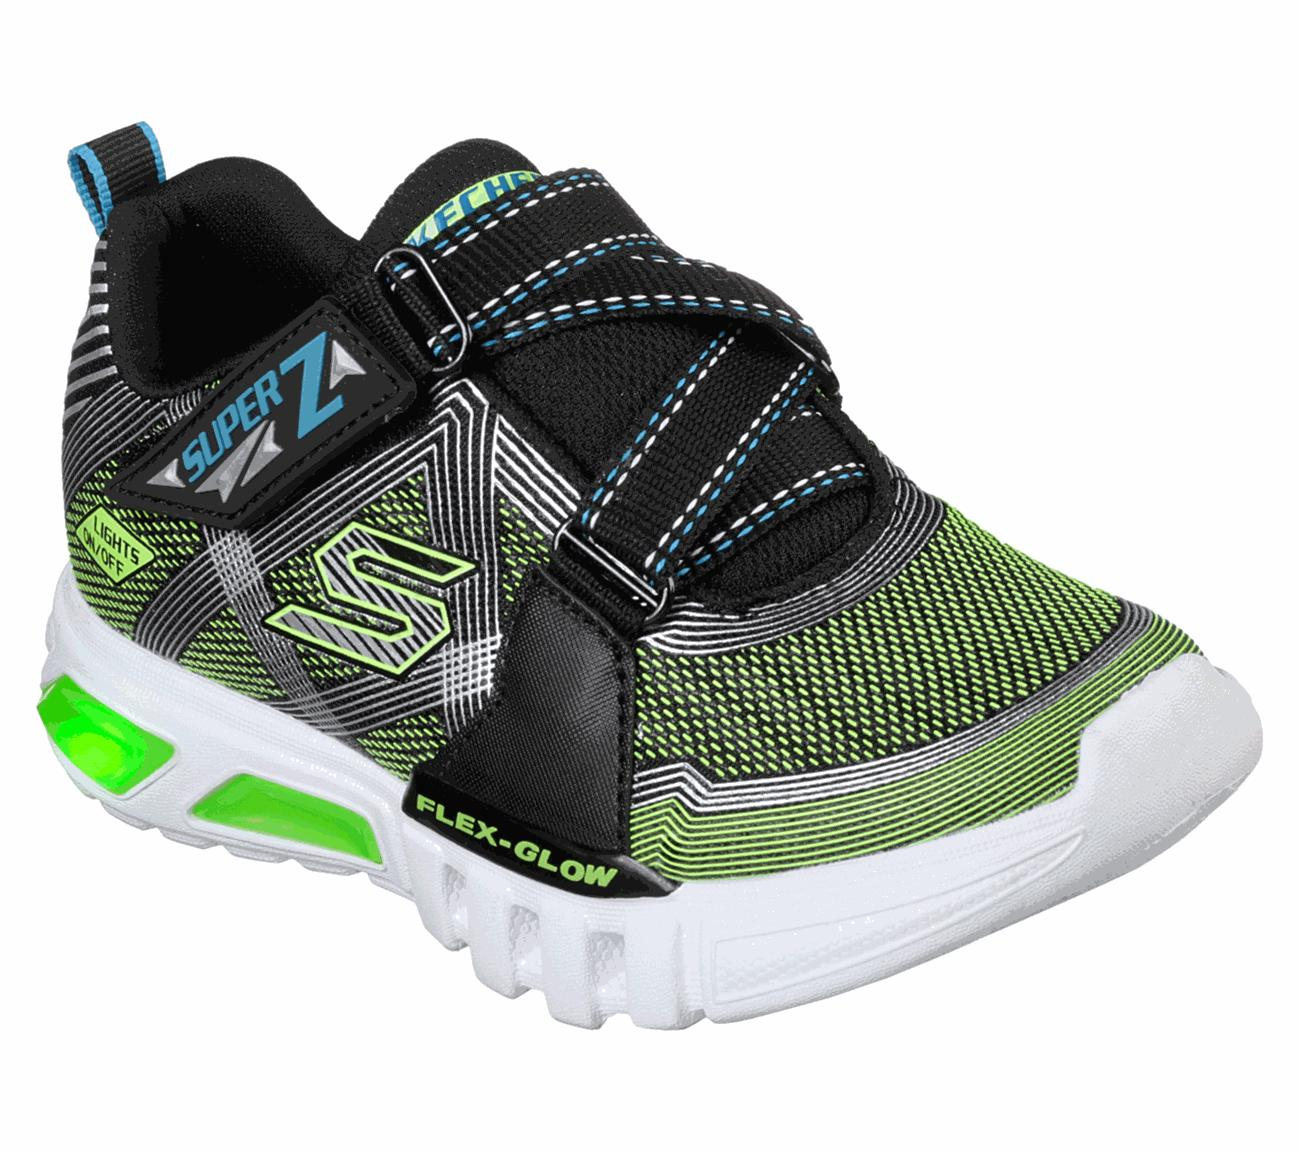 9109f8116e9 Skechers - S Lights  Flex-Glow - Parrox Sepatu Sport Sneakers Anak Laki-